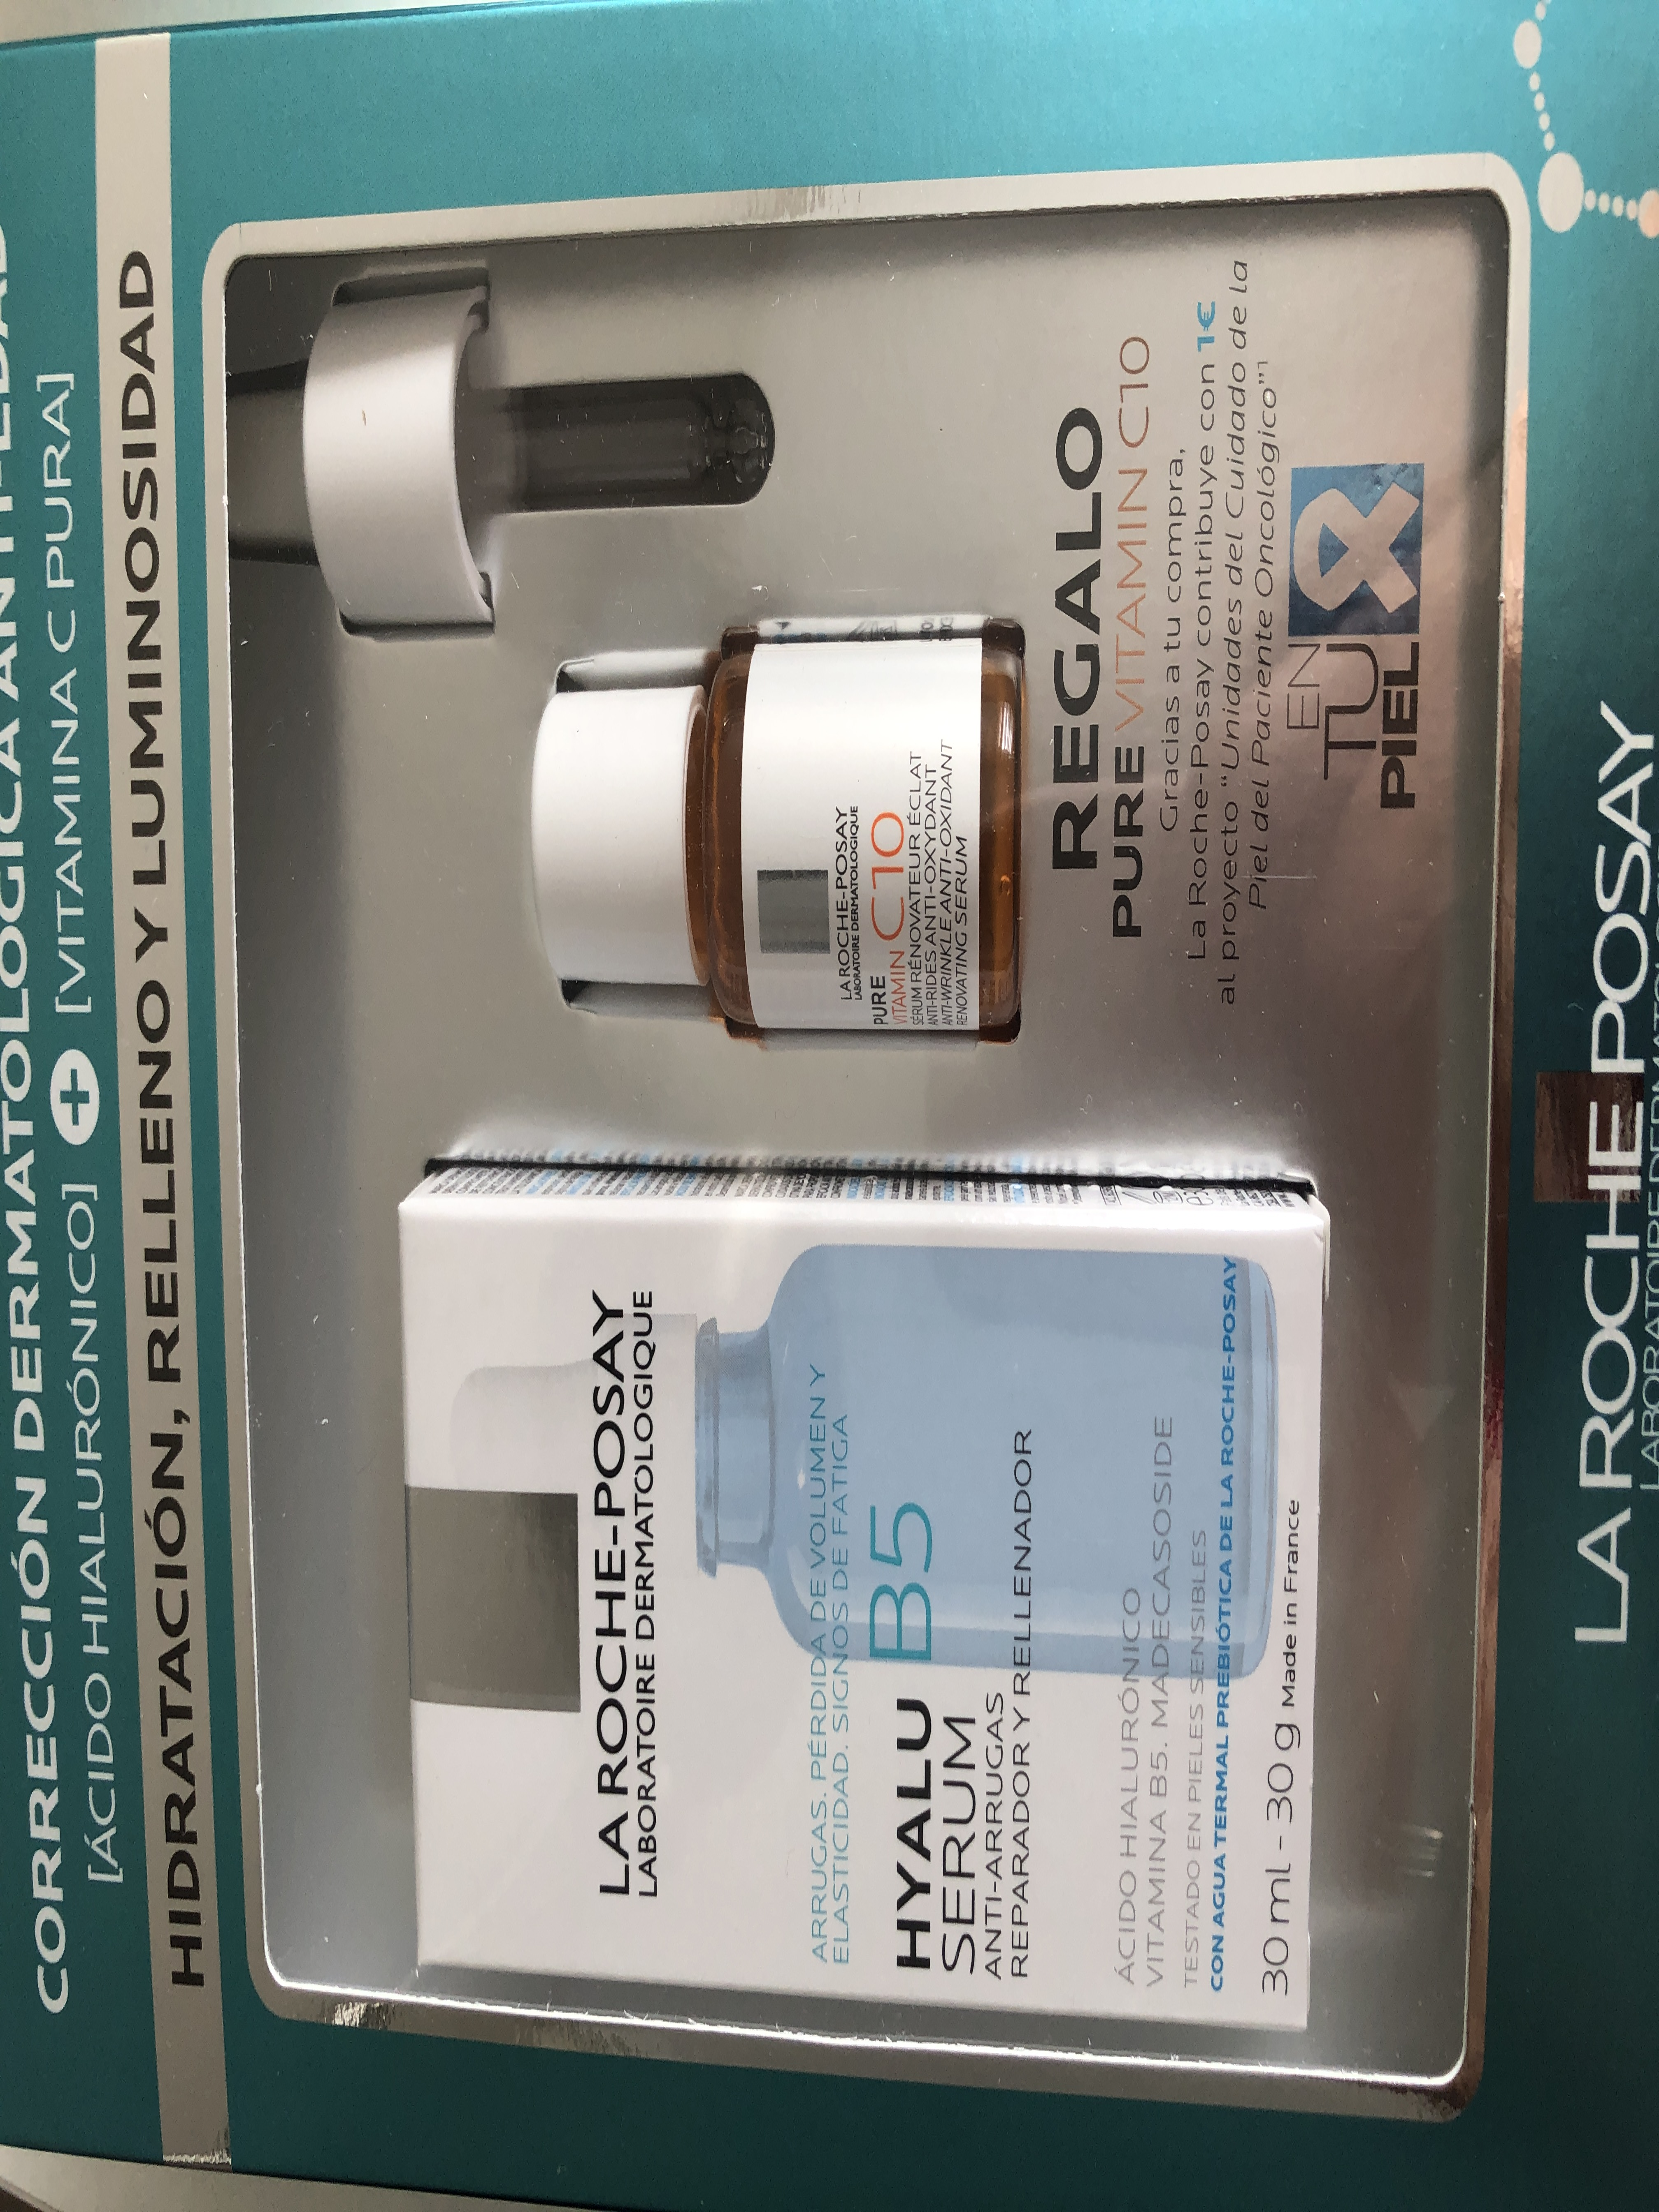 La Roche Posay Hyalu B5 Serum Pack Gift Vit C Serum Aliexpress